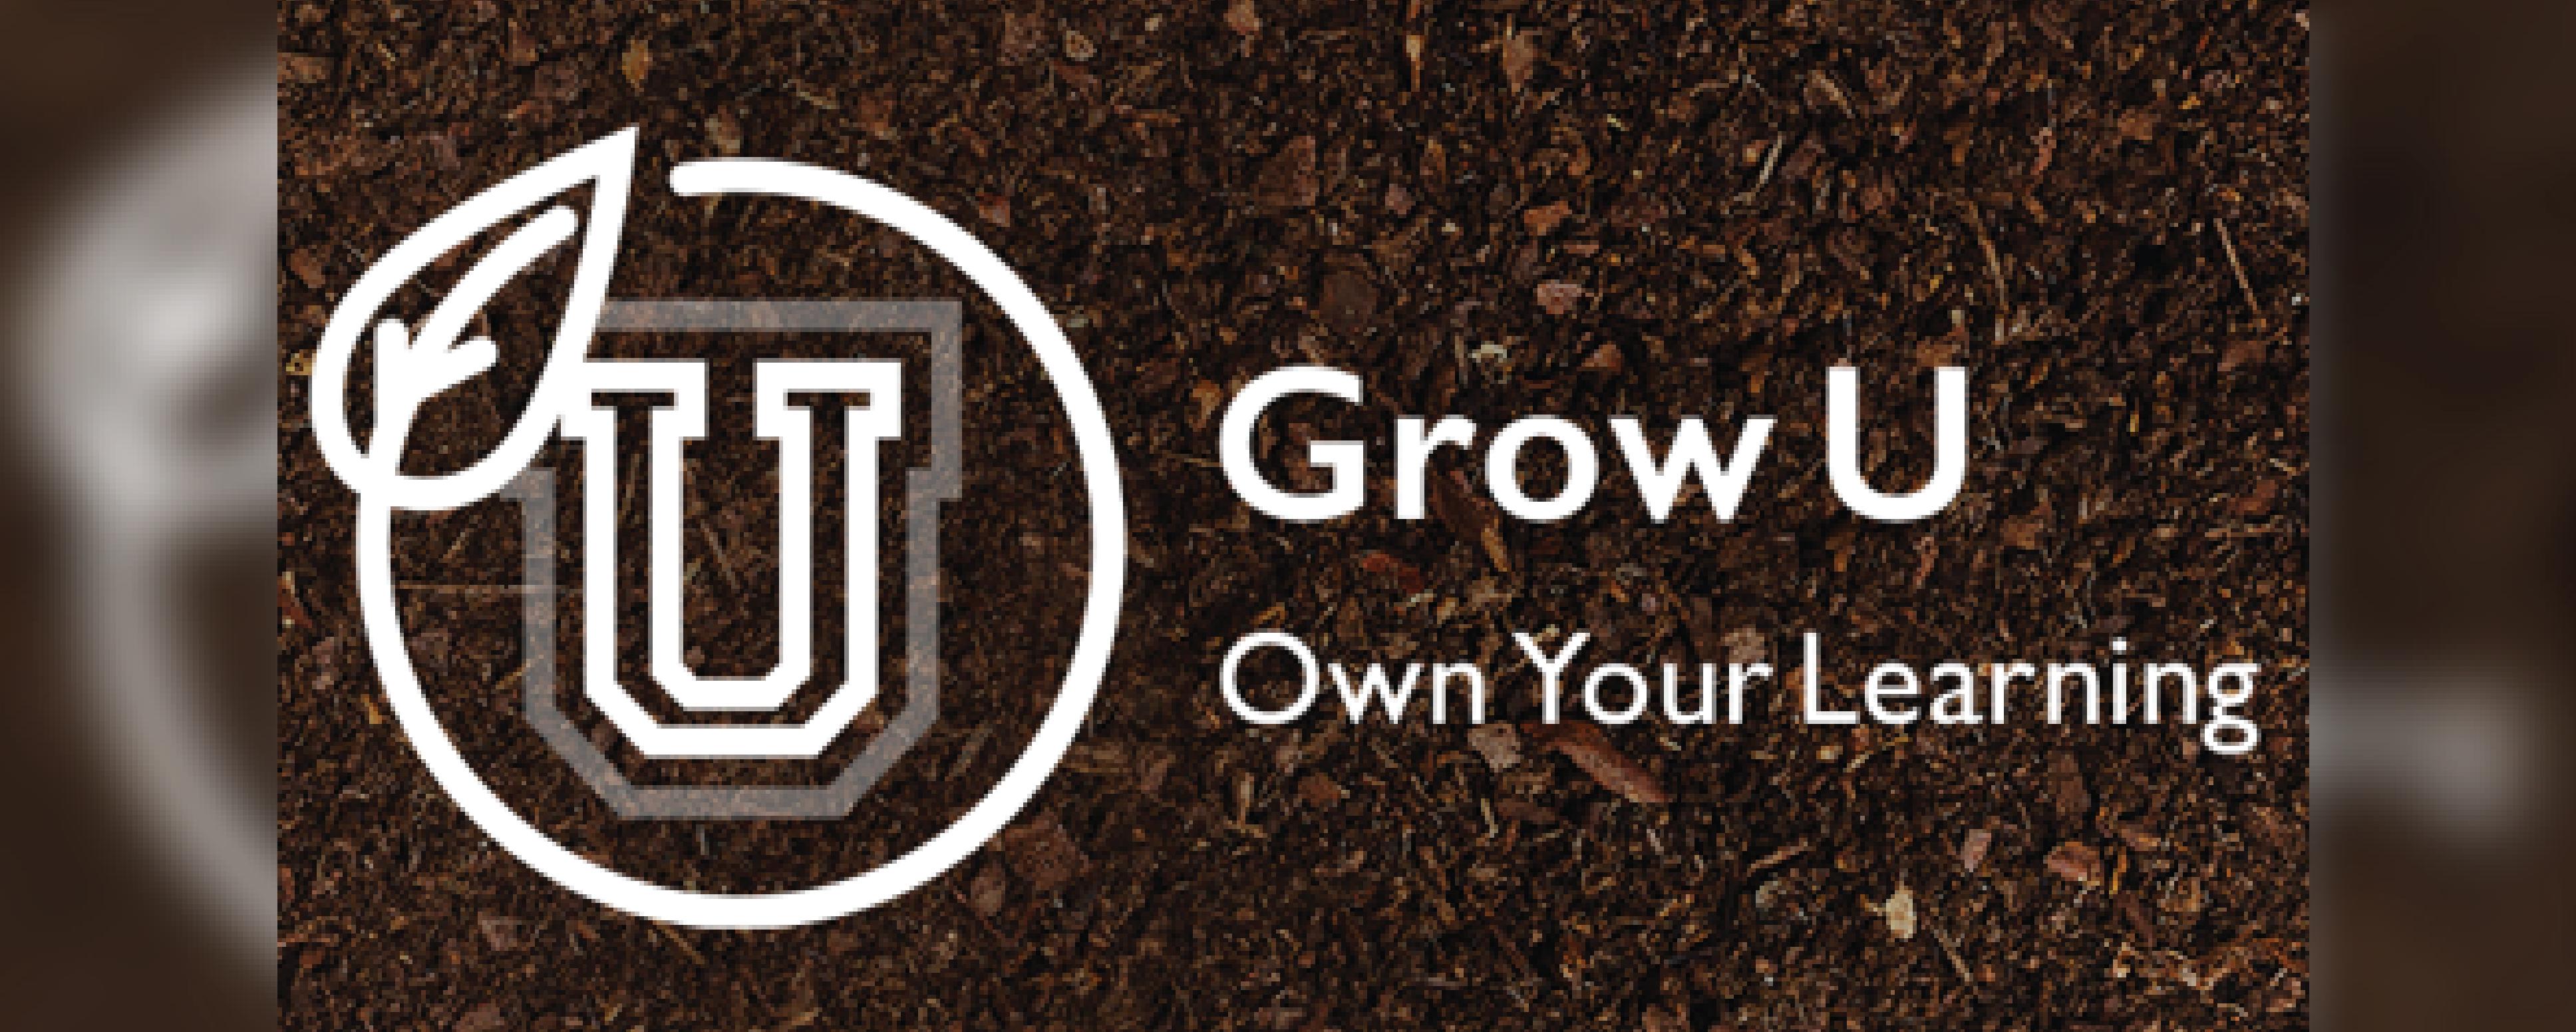 grow u-01